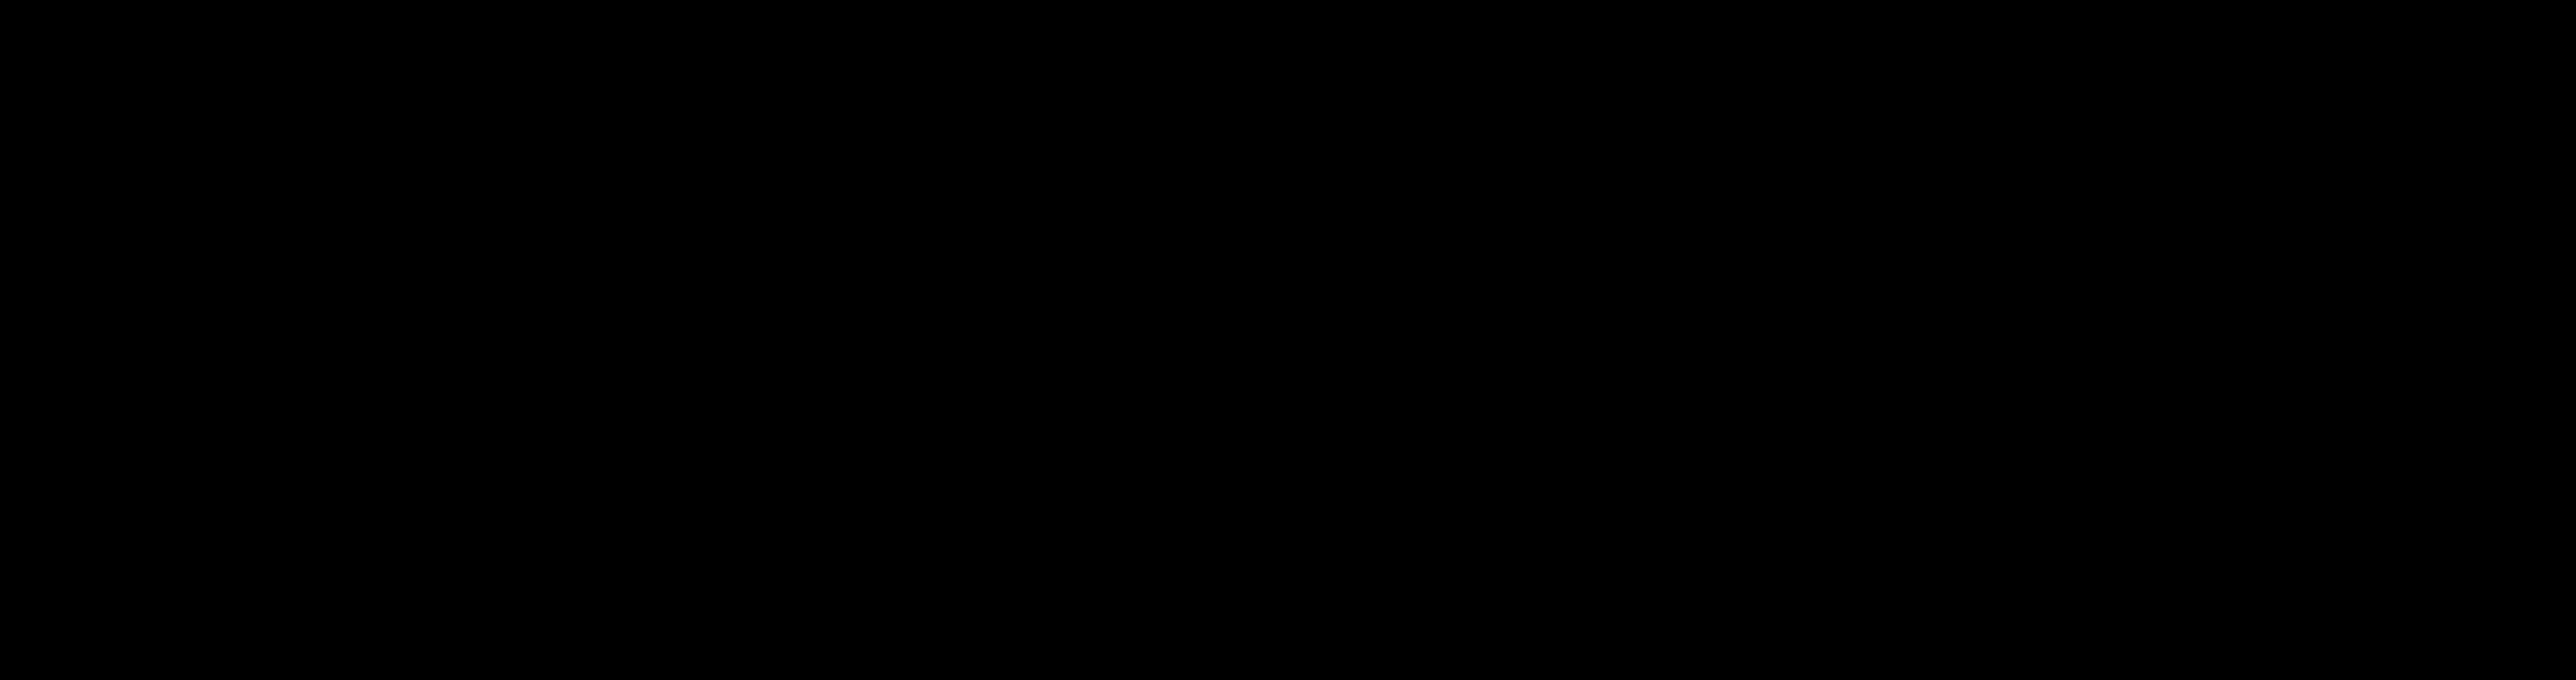 N-[6-(Biotinamido)hexanoyl]cystamine